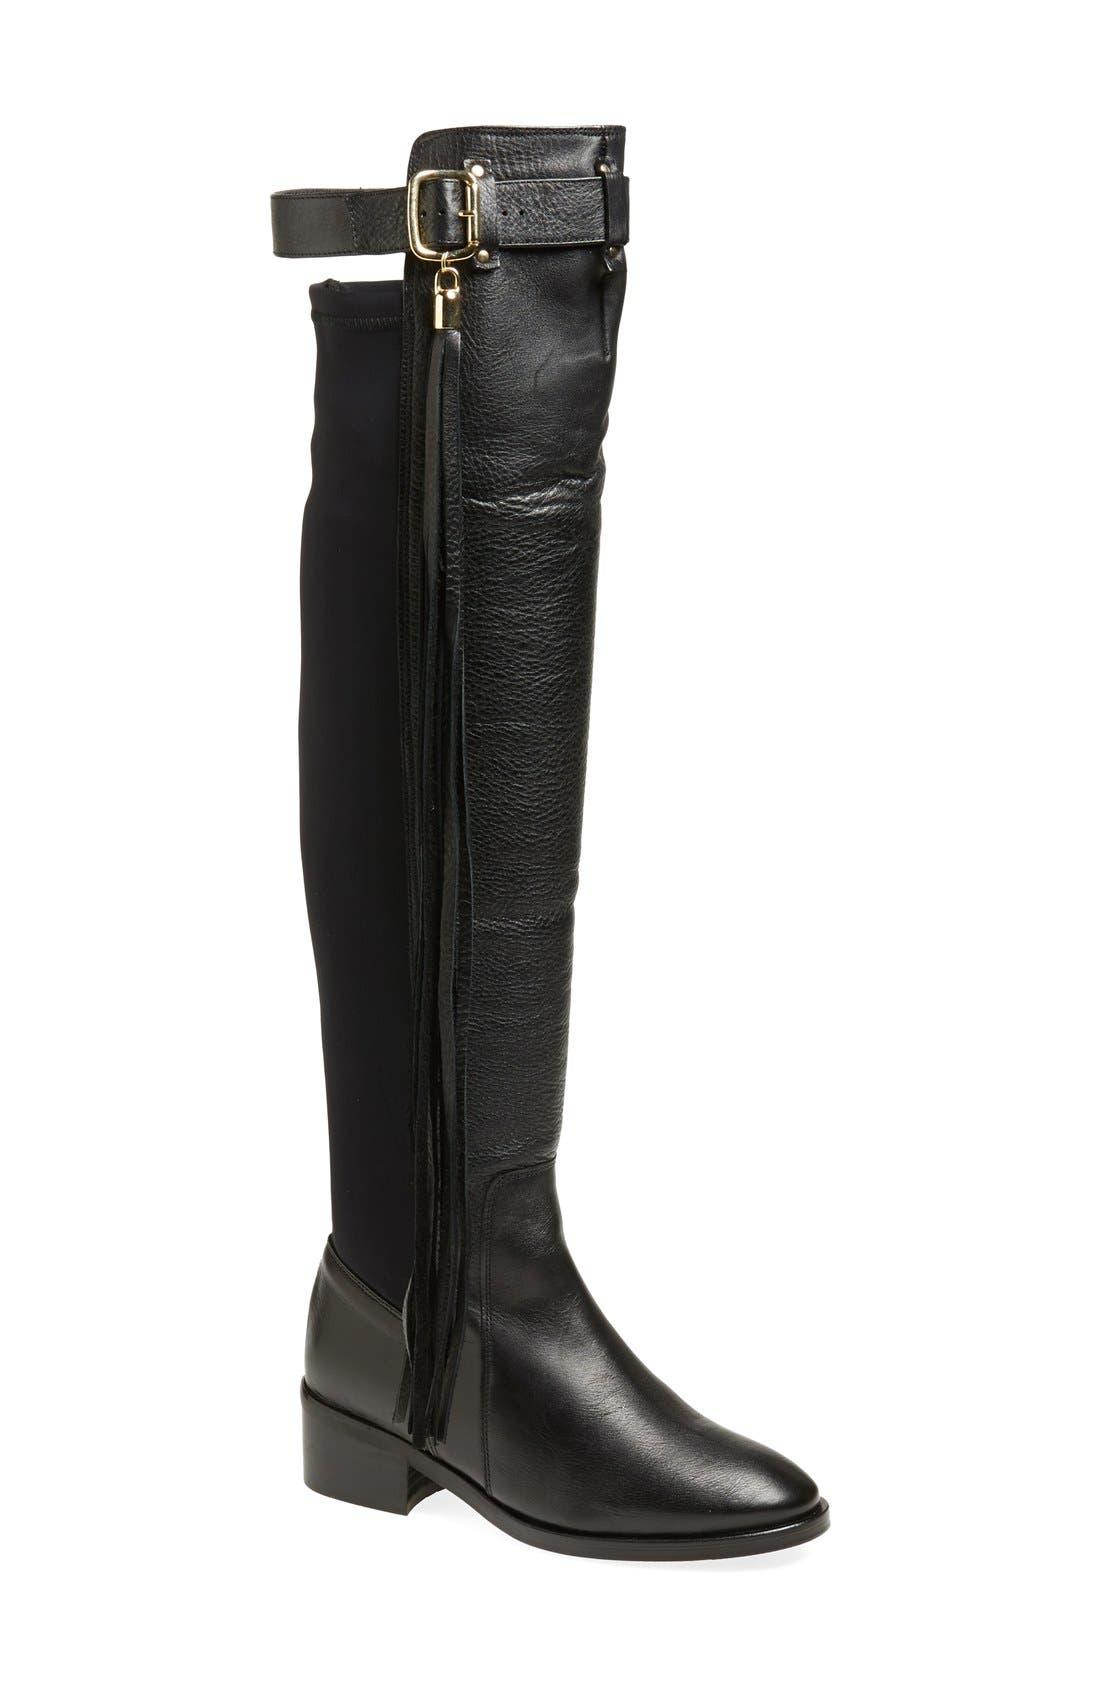 Main Image - KG Kurt Geiger 'Vixen' Over the Knee Leather Boot (Women)